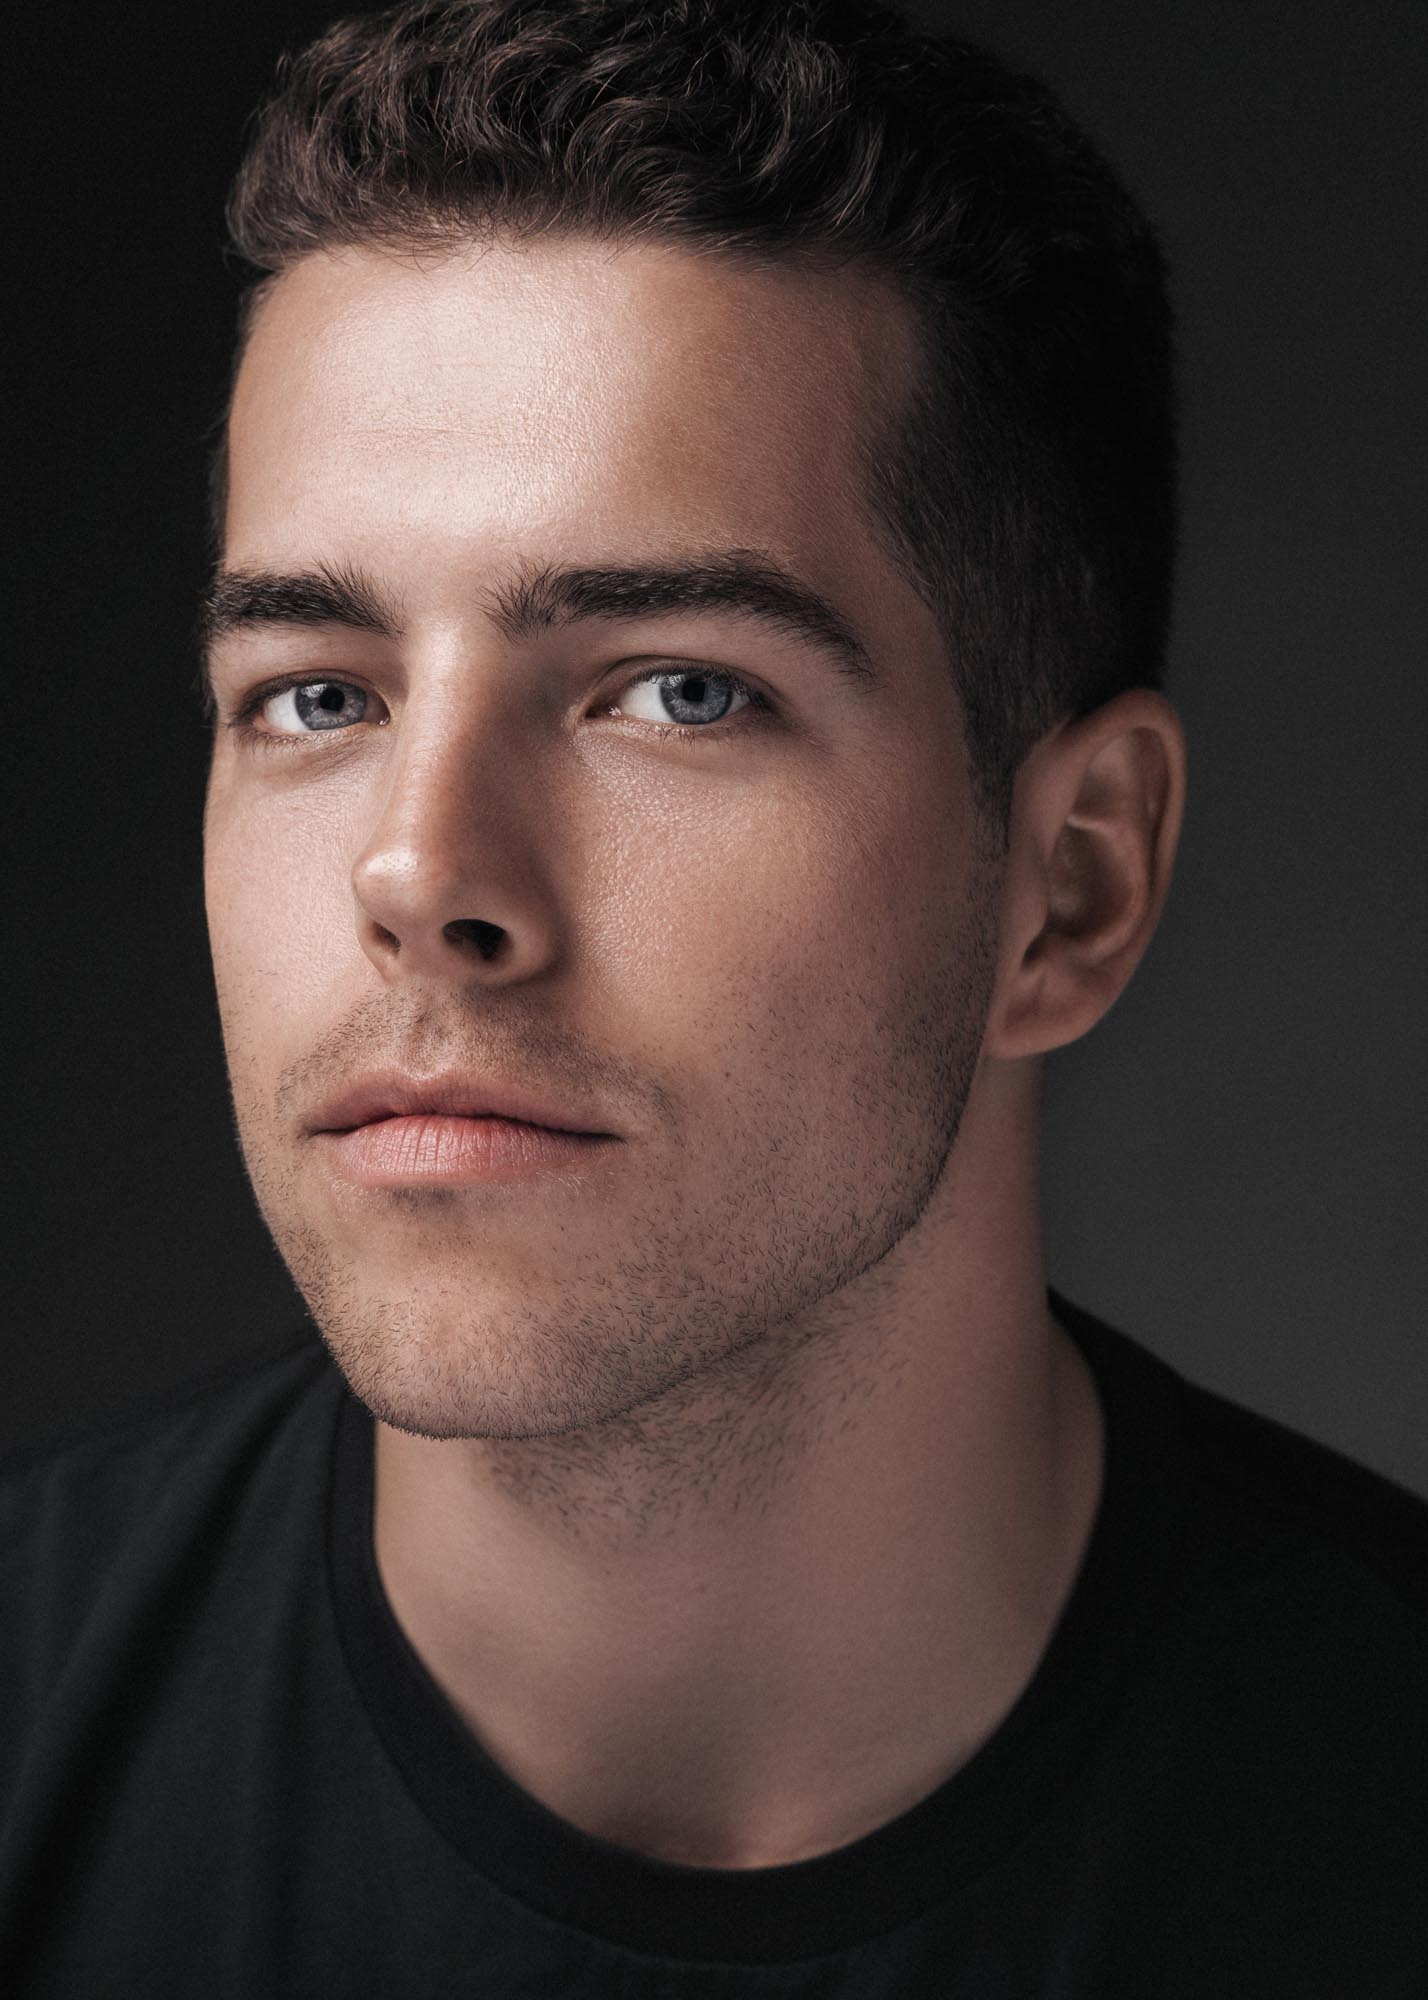 nyc-photographers-male-model-test-10005.jpg